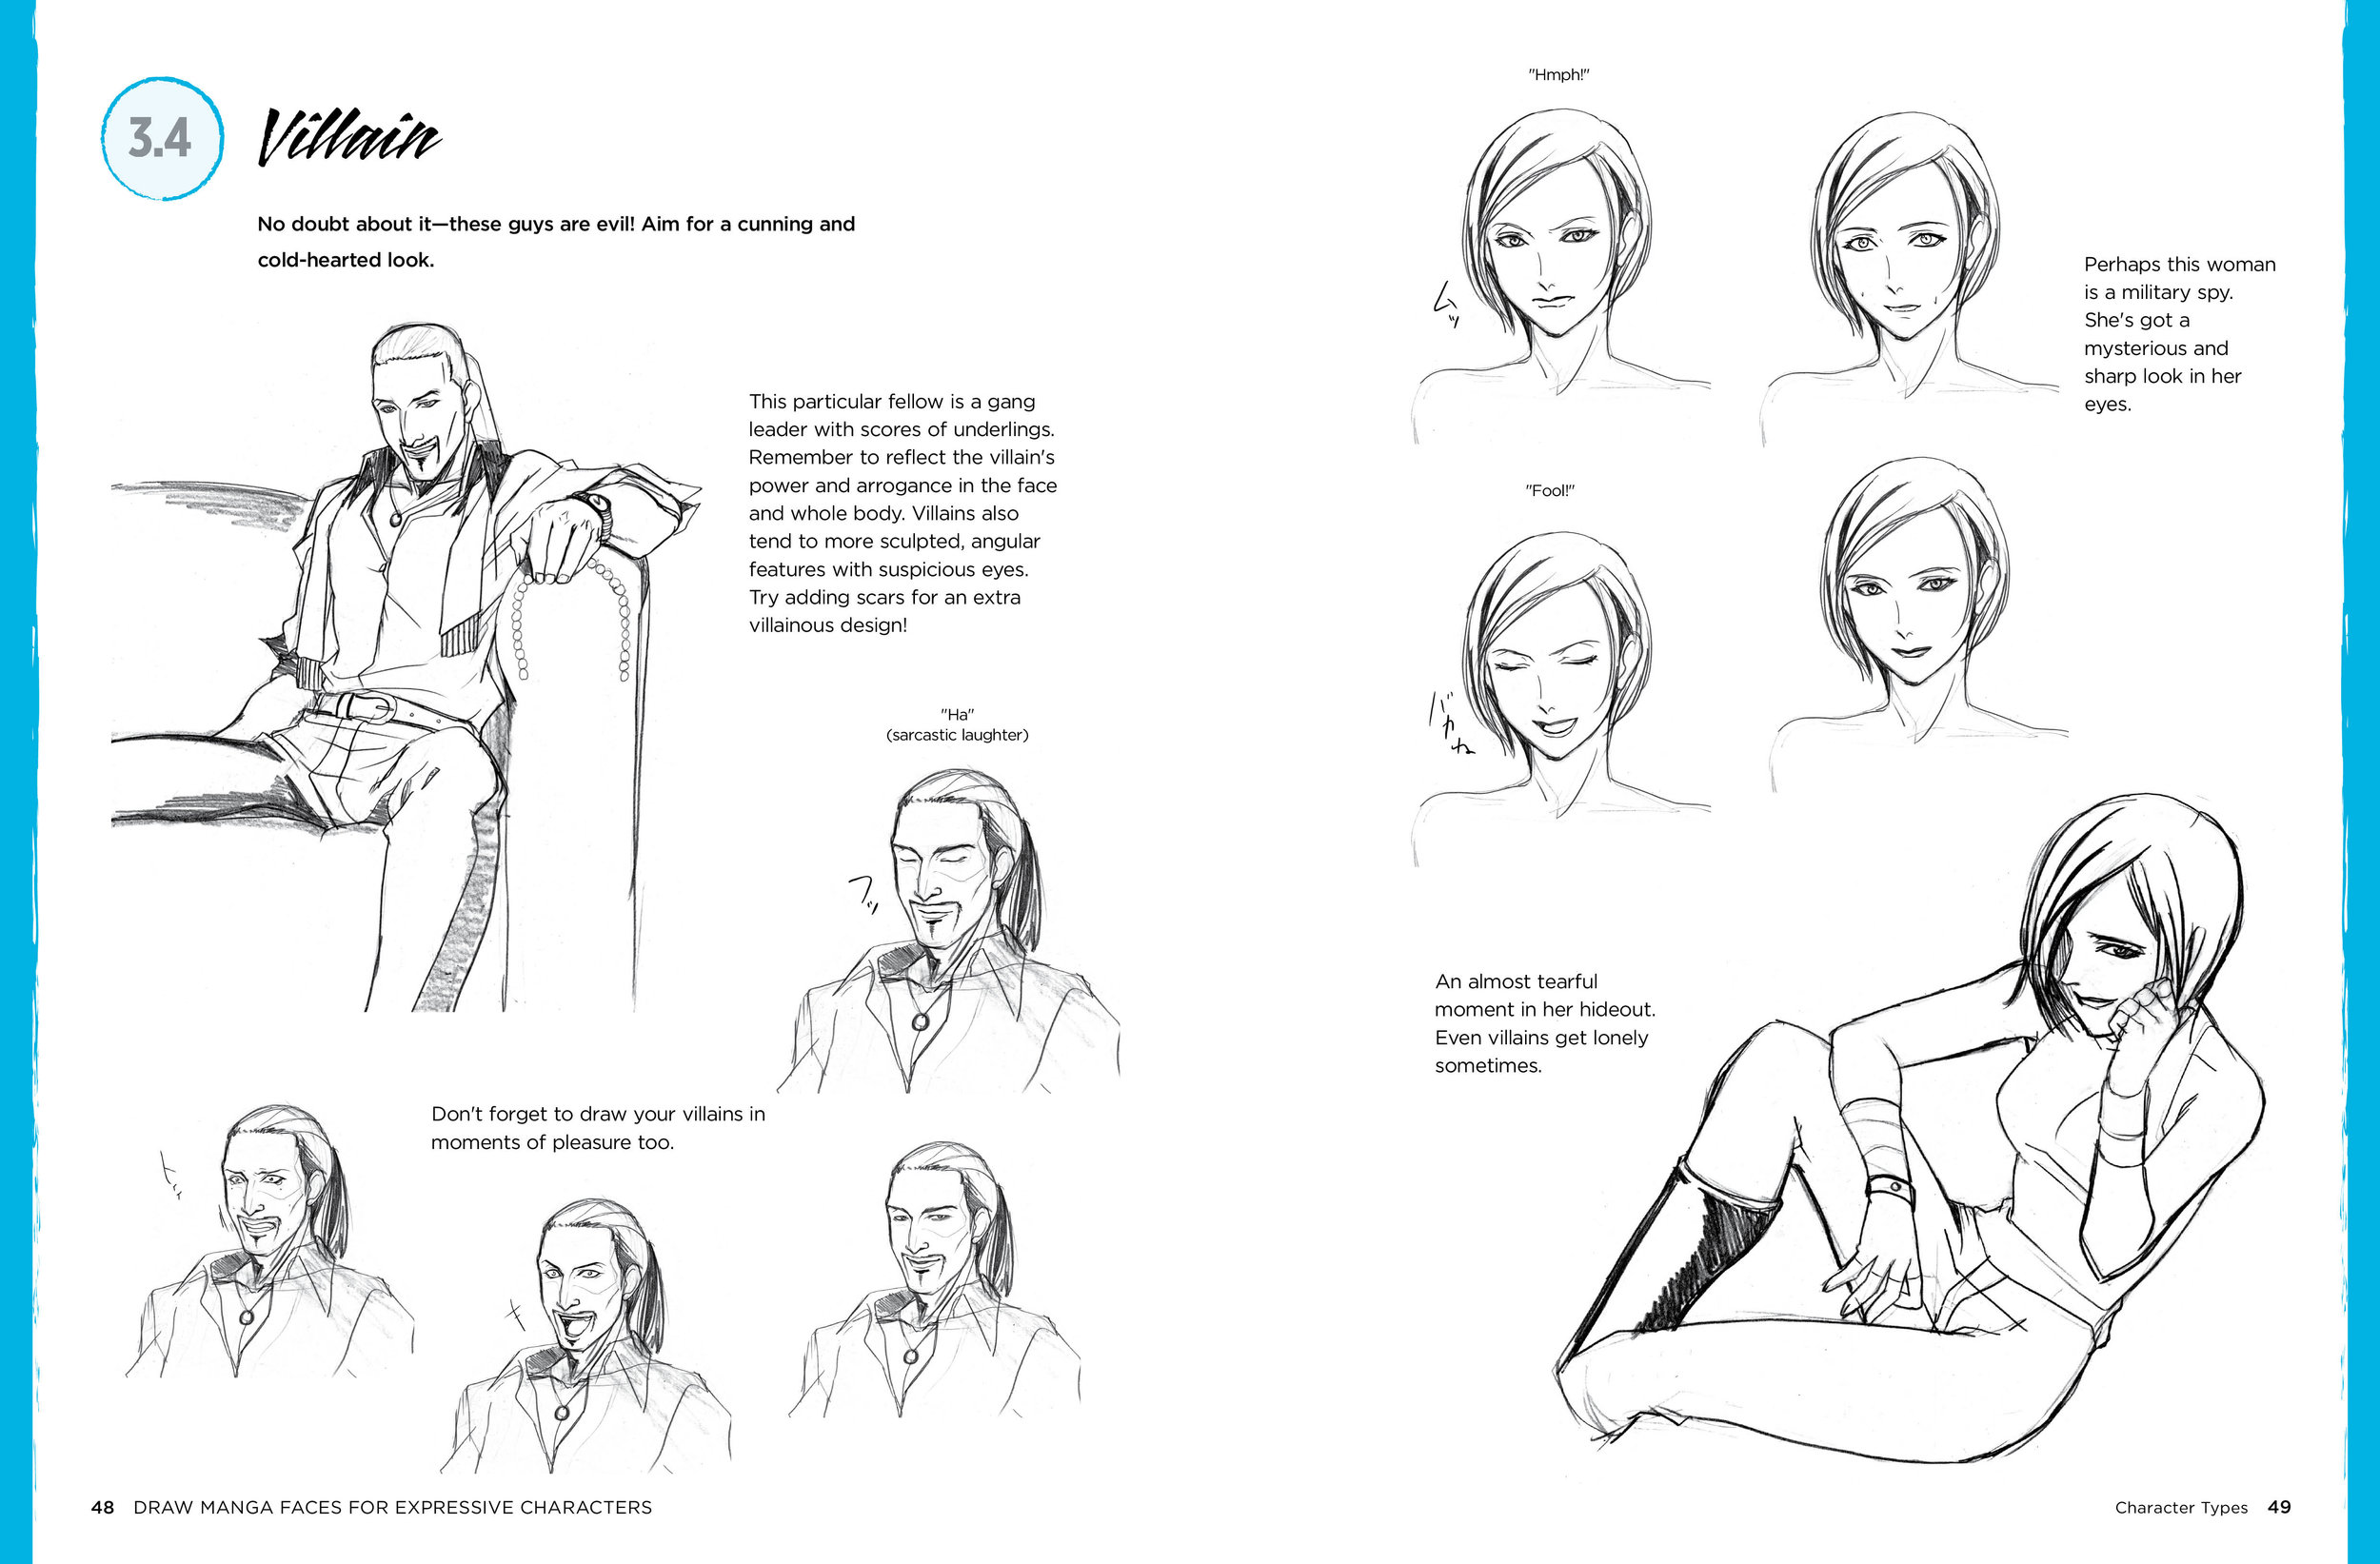 Draw Manga Faces 48.49.jpg